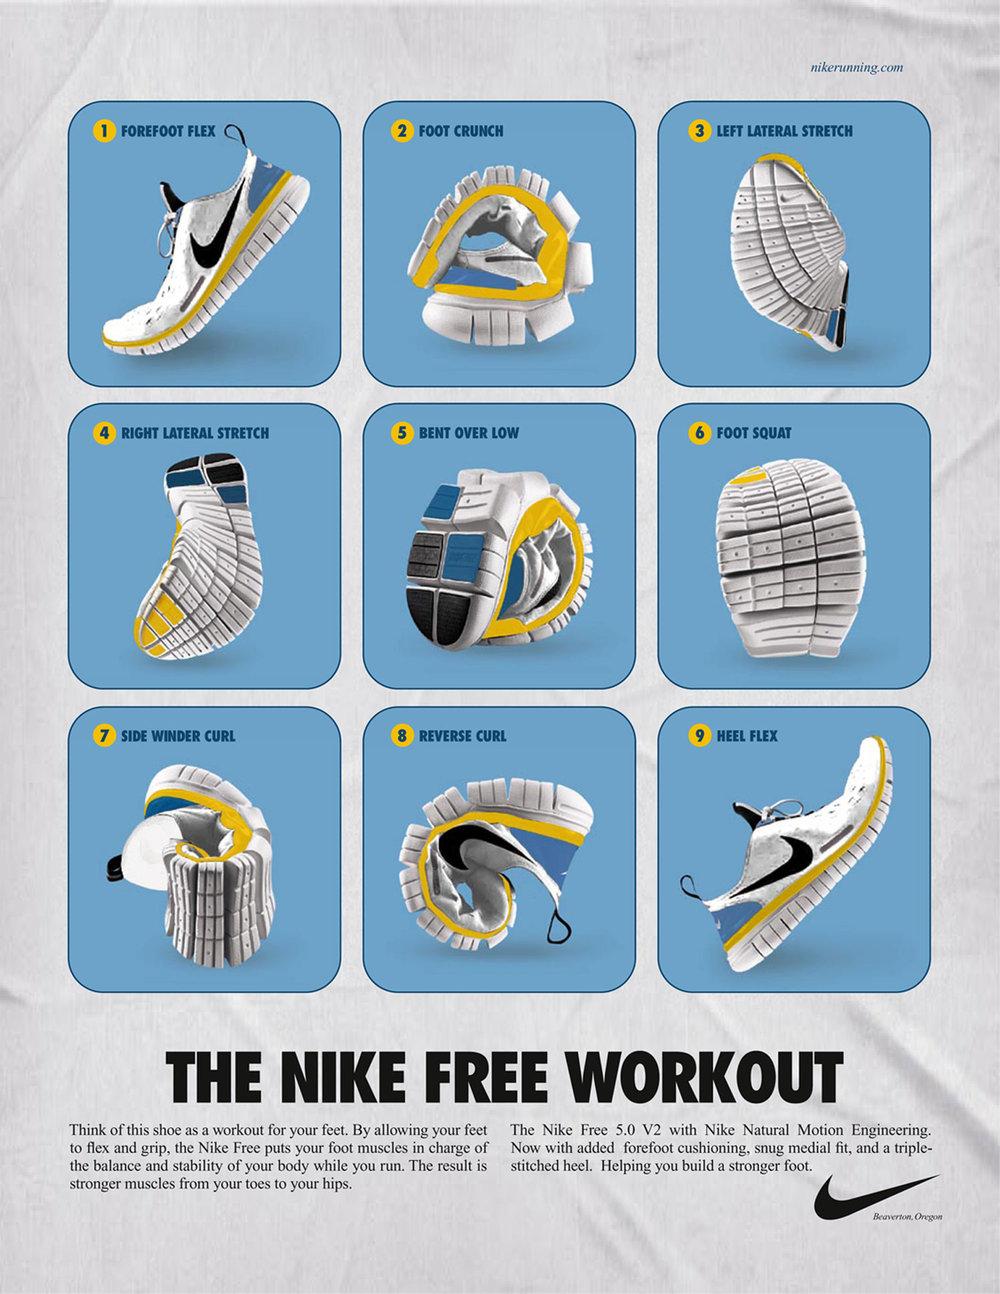 NikeFREE_v3.jpg